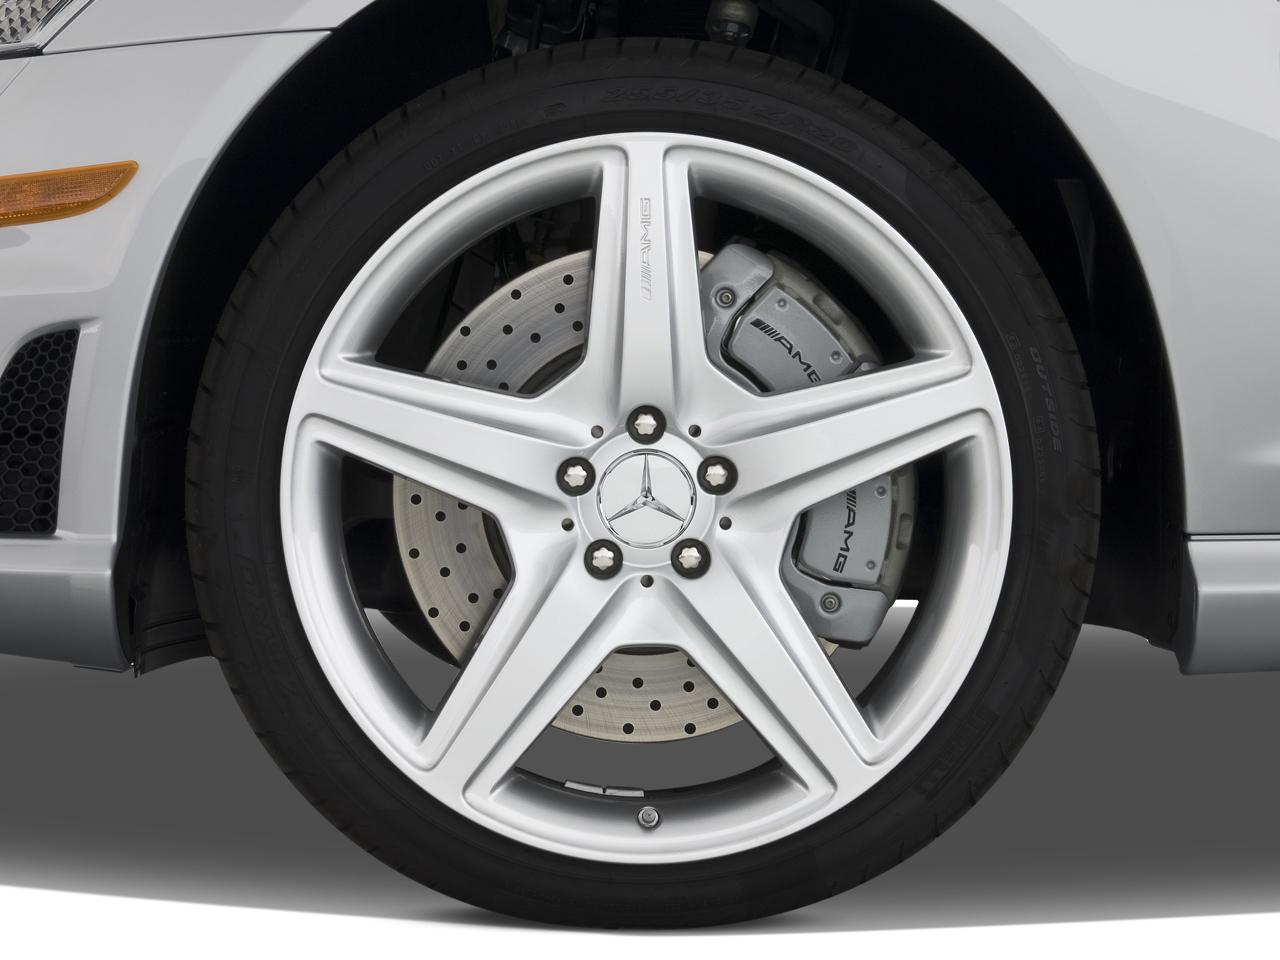 2009 mercedes benz s63 amg mercedes benz luxury sedan for Mercedes benz hub caps